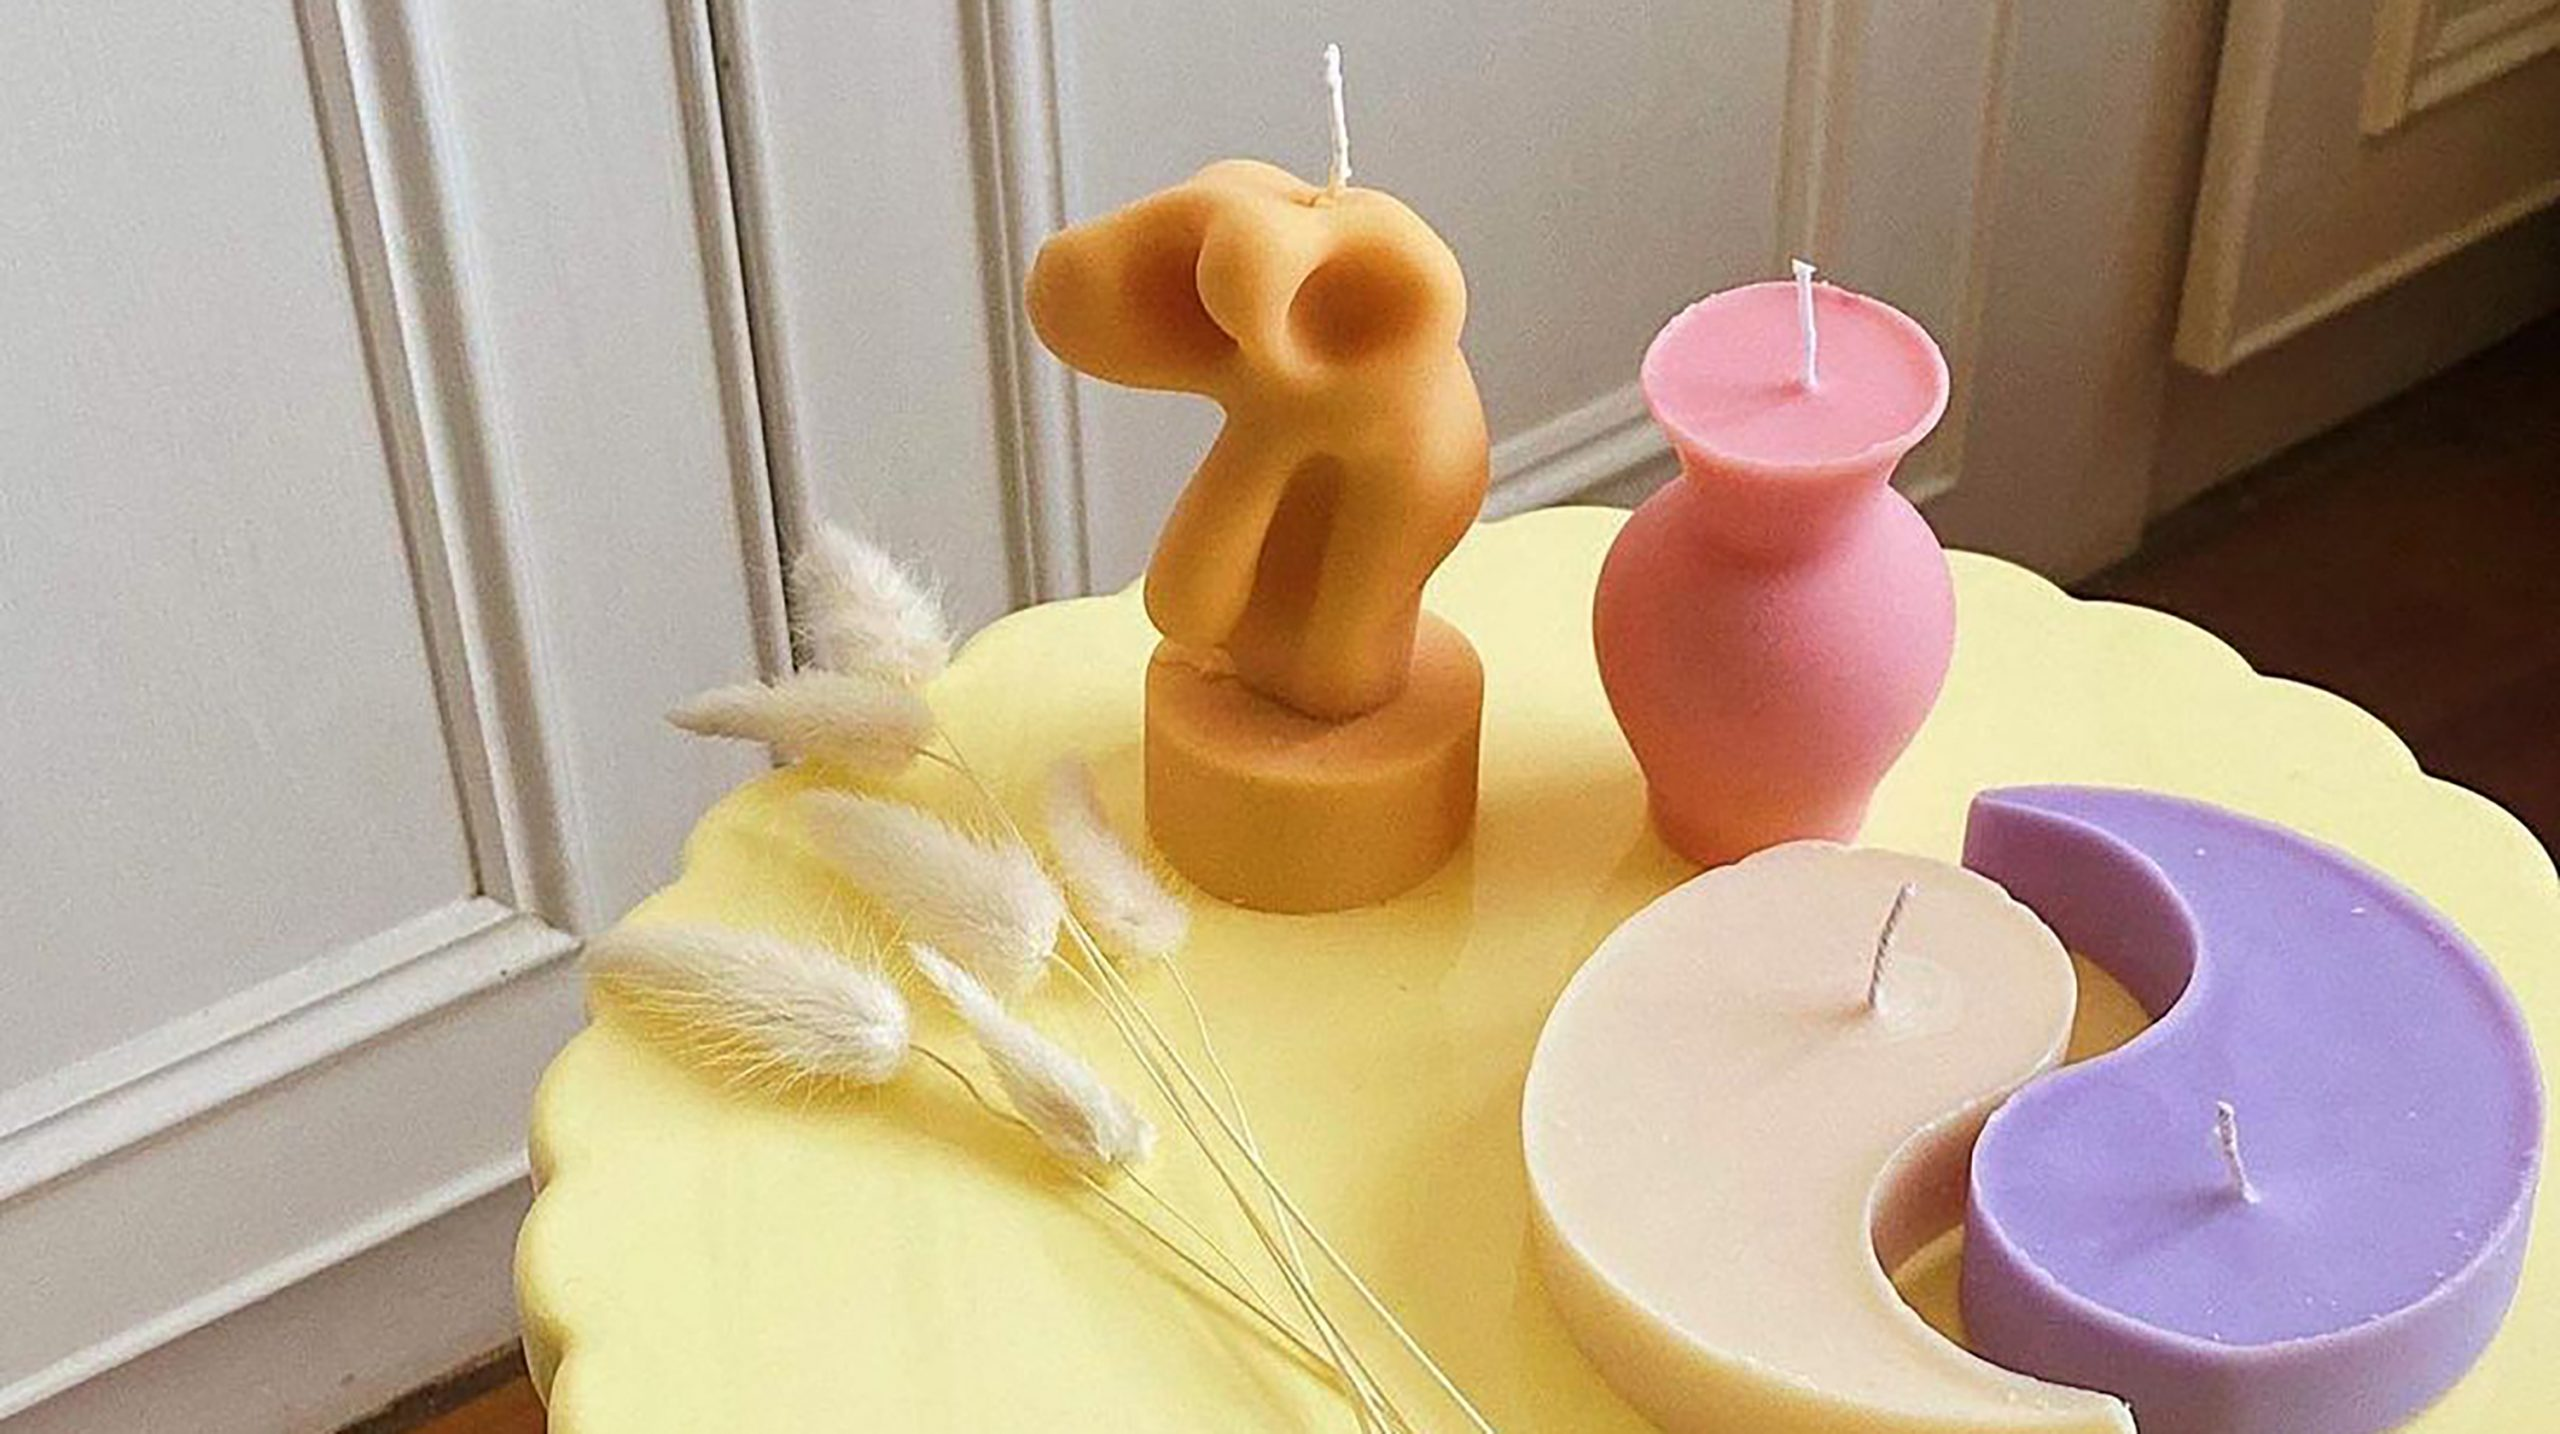 candele-colorate,-belle-come-sculture